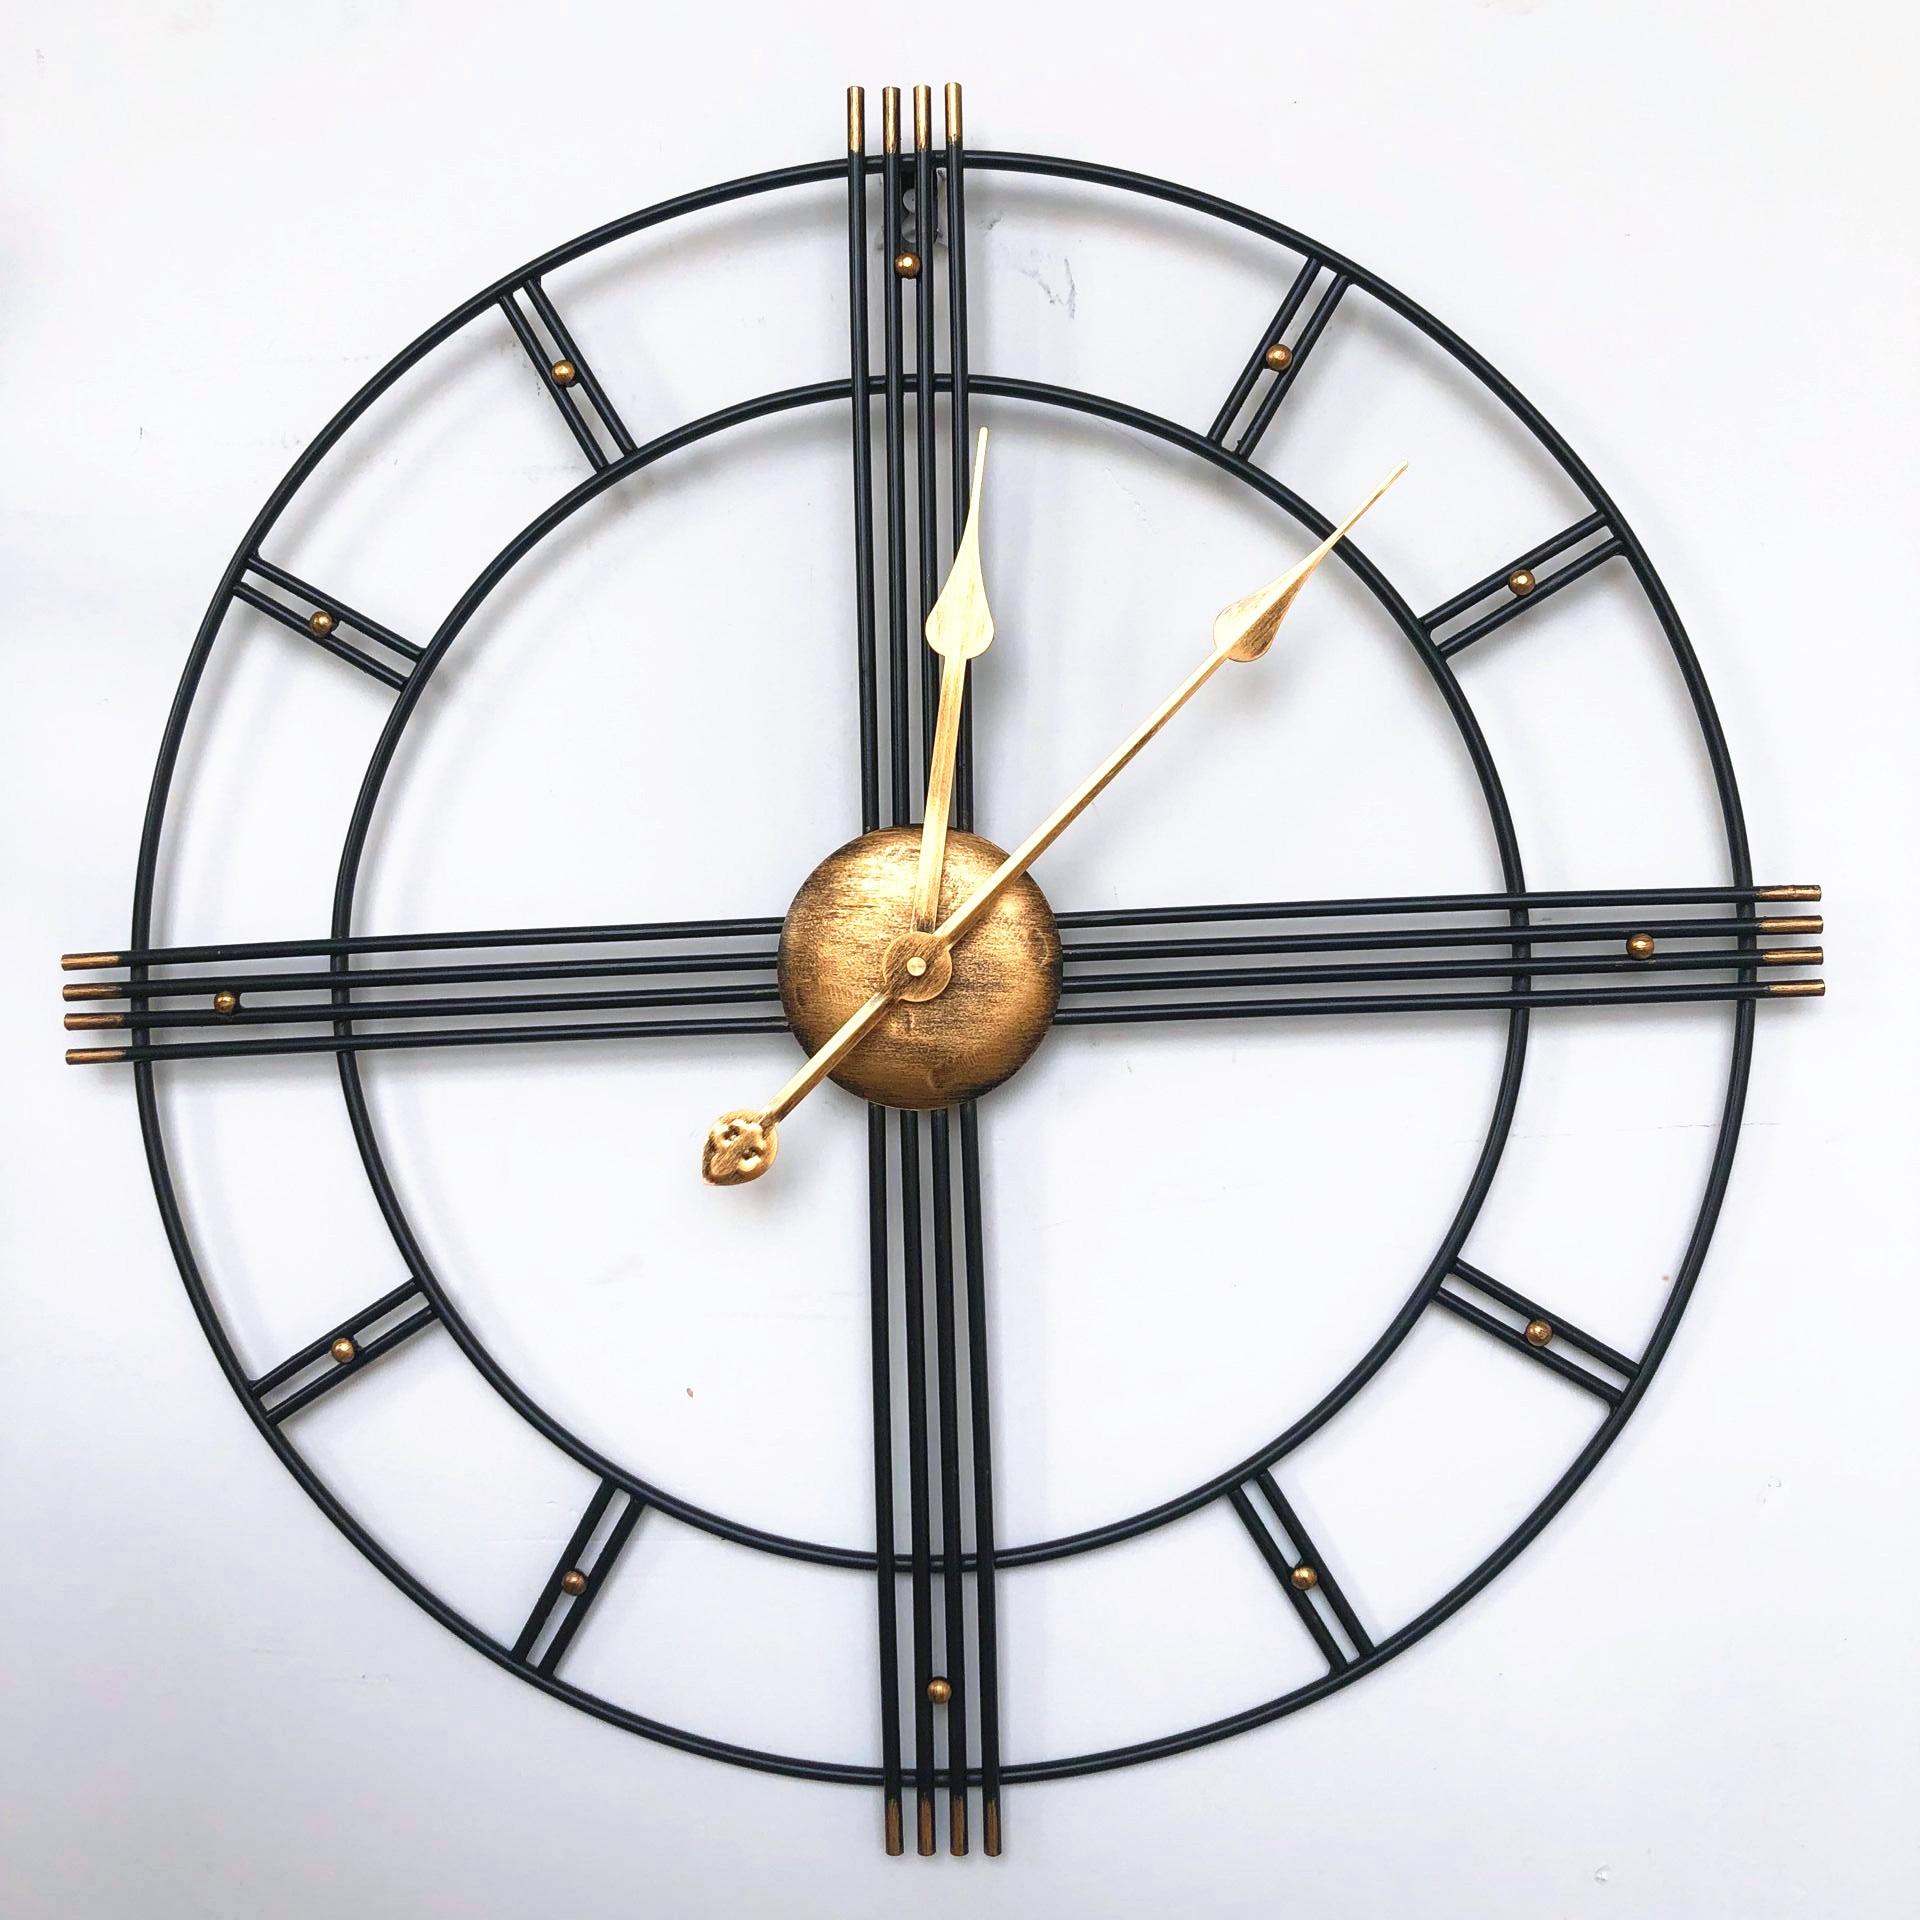 60cm Nordic Creative Retro Metal Wrought Iron Roman Clock Wall Clock Modern Design Living Room Silent Decorative Quartz Clock